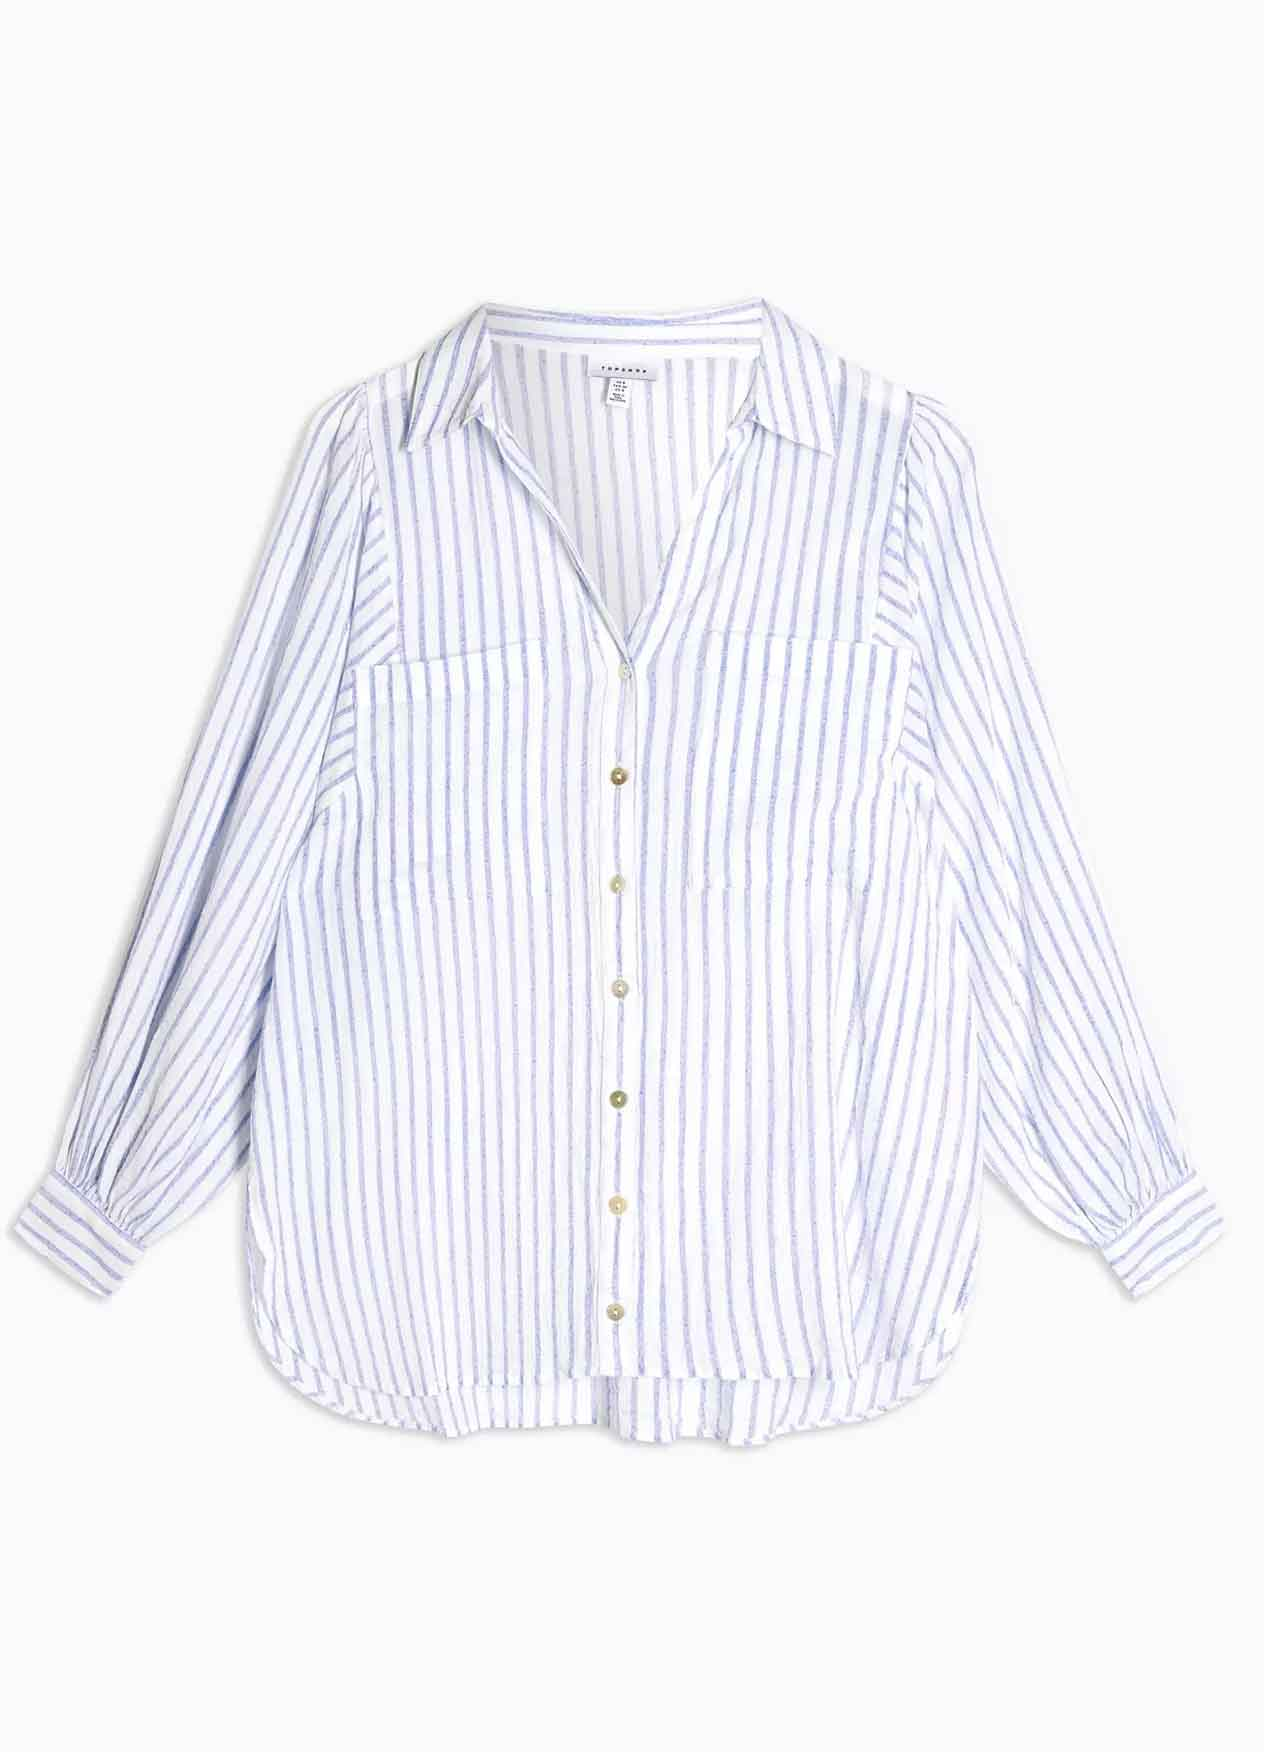 stripe shirt topshop